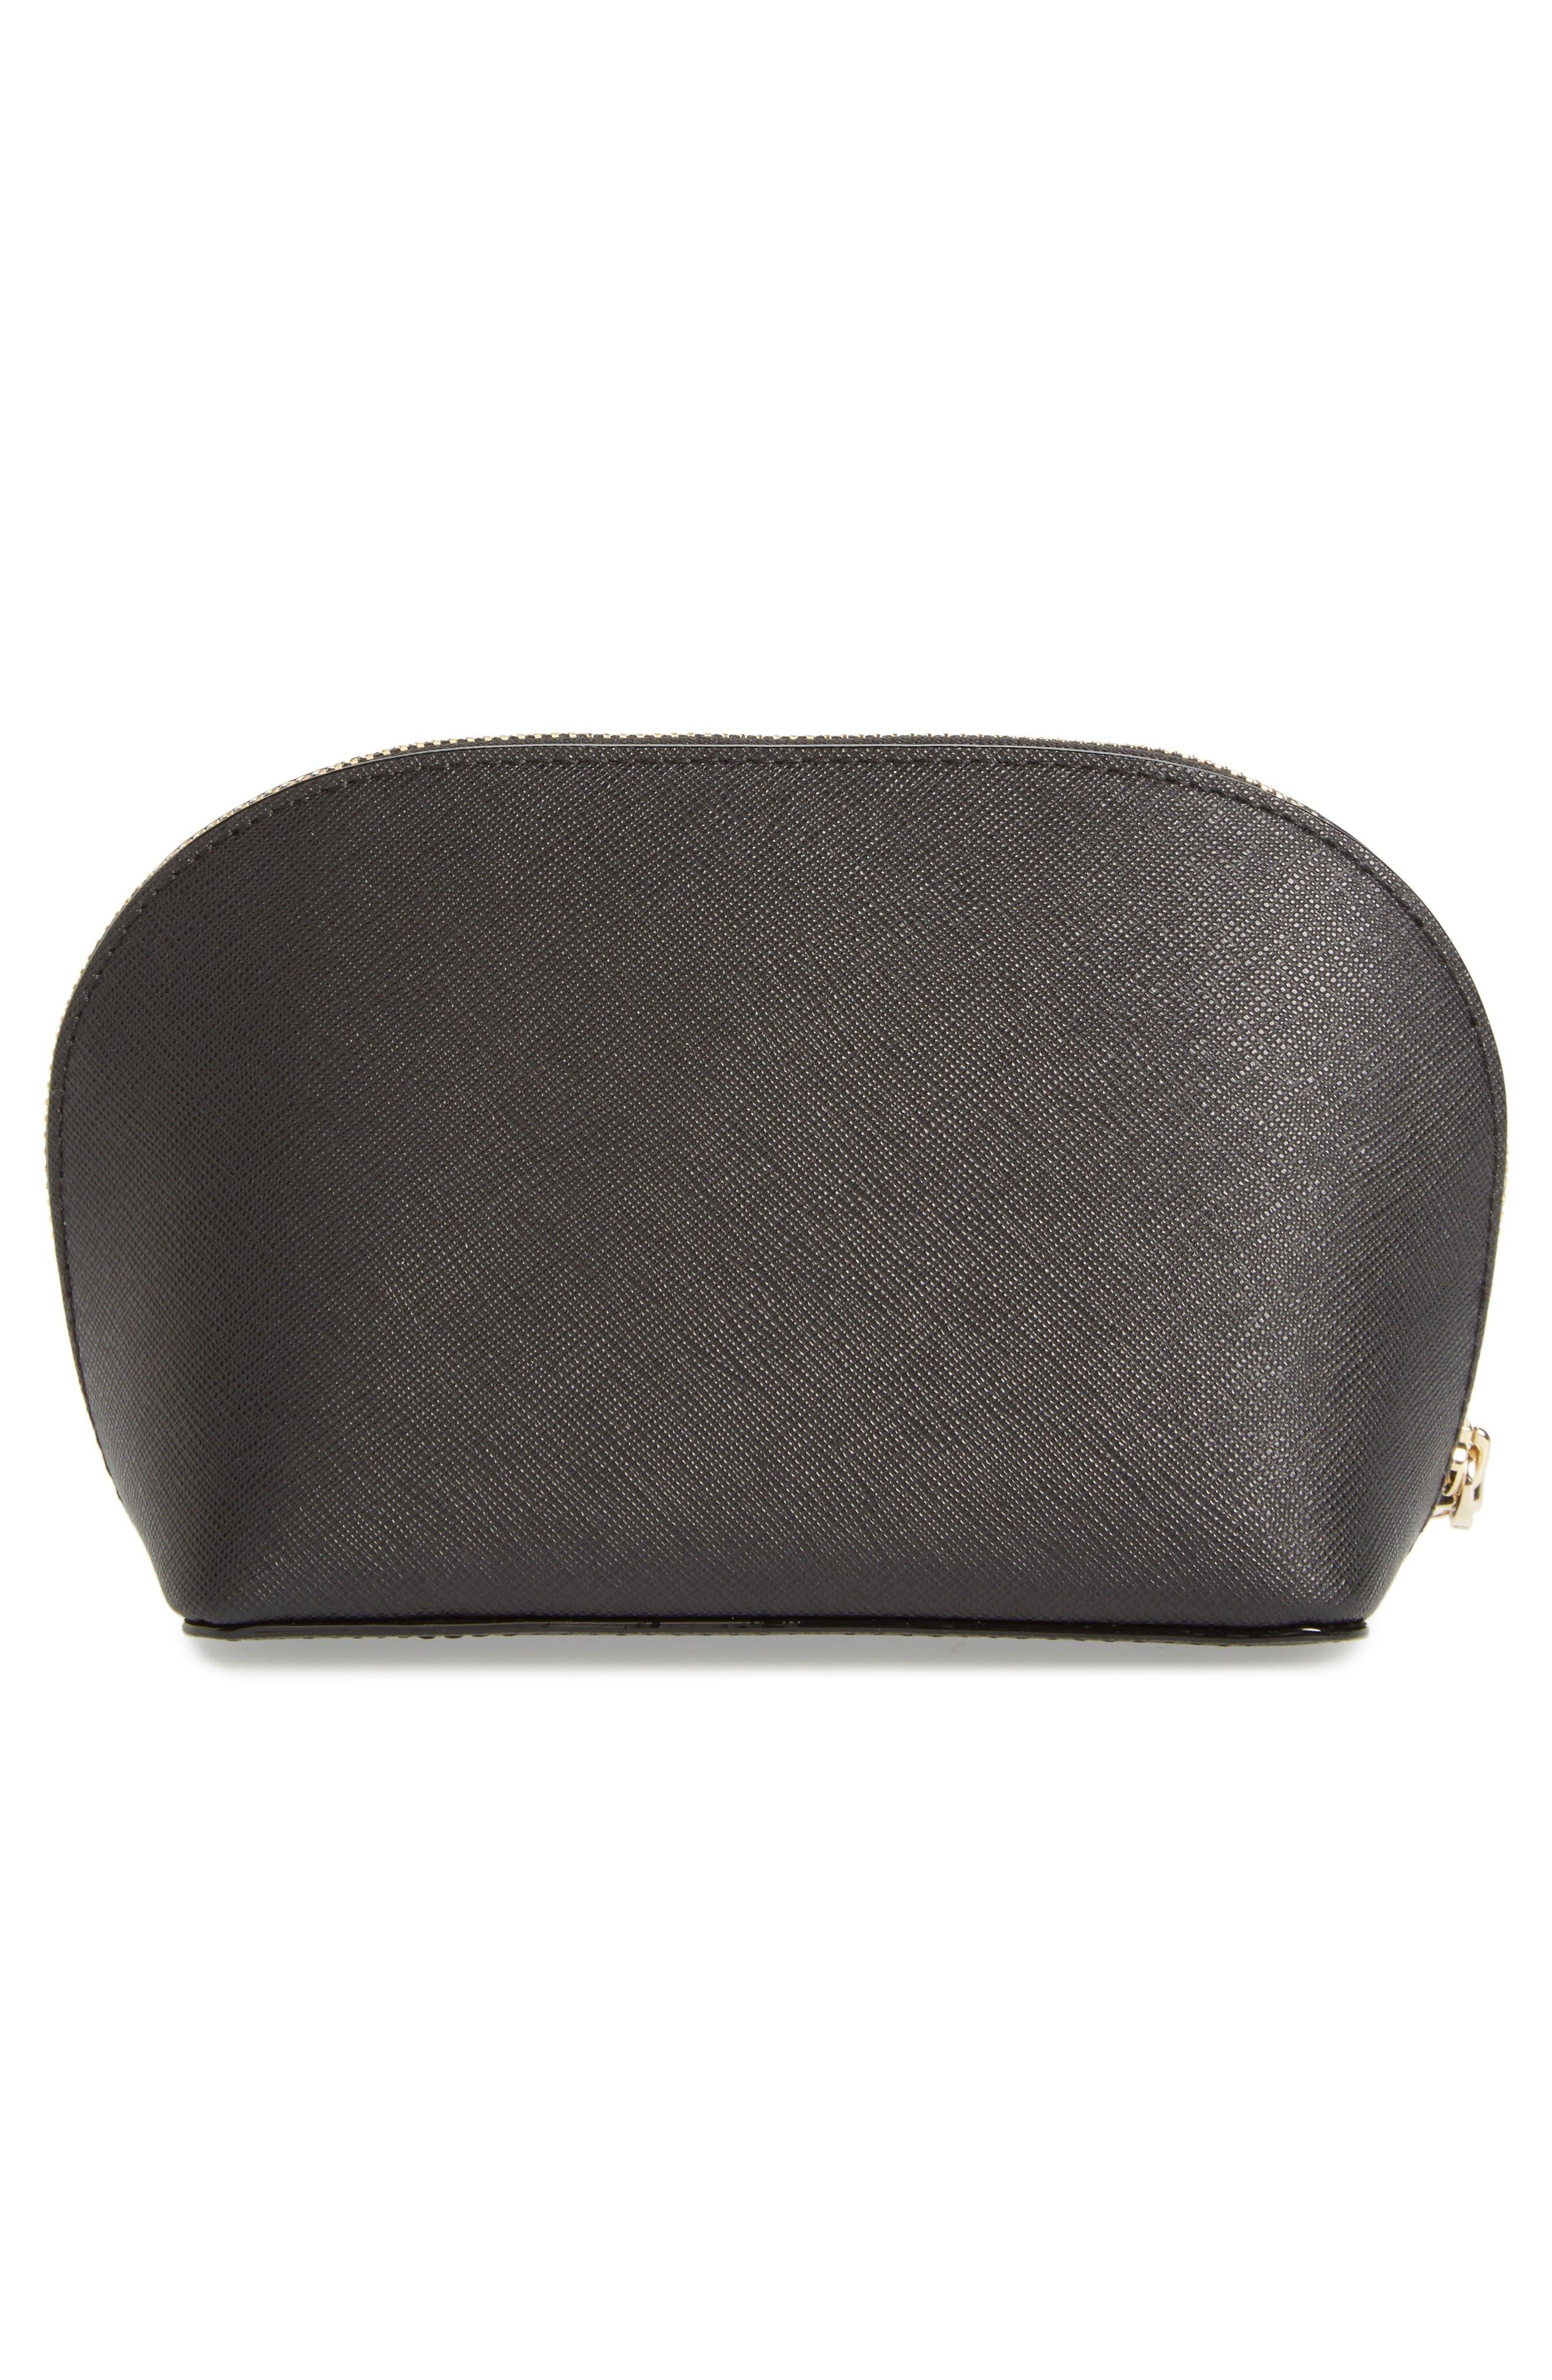 cameron street - small abalene leather cosmetics bag,                             Alternate thumbnail 2, color,                             Black